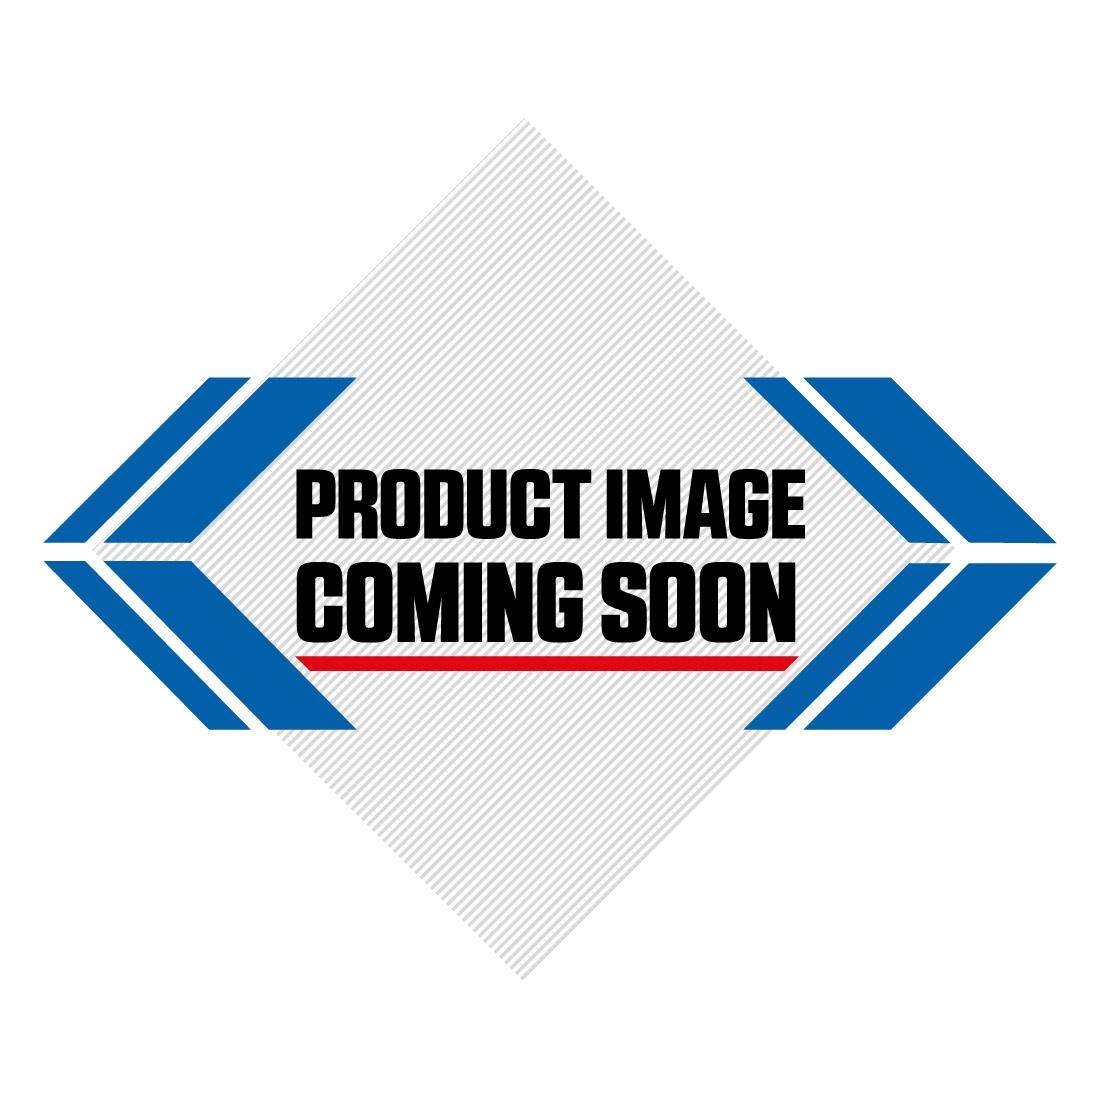 Kawasaki Restyled Plastic Kit KX 85 (01-09) (11-12) Black Image-1>